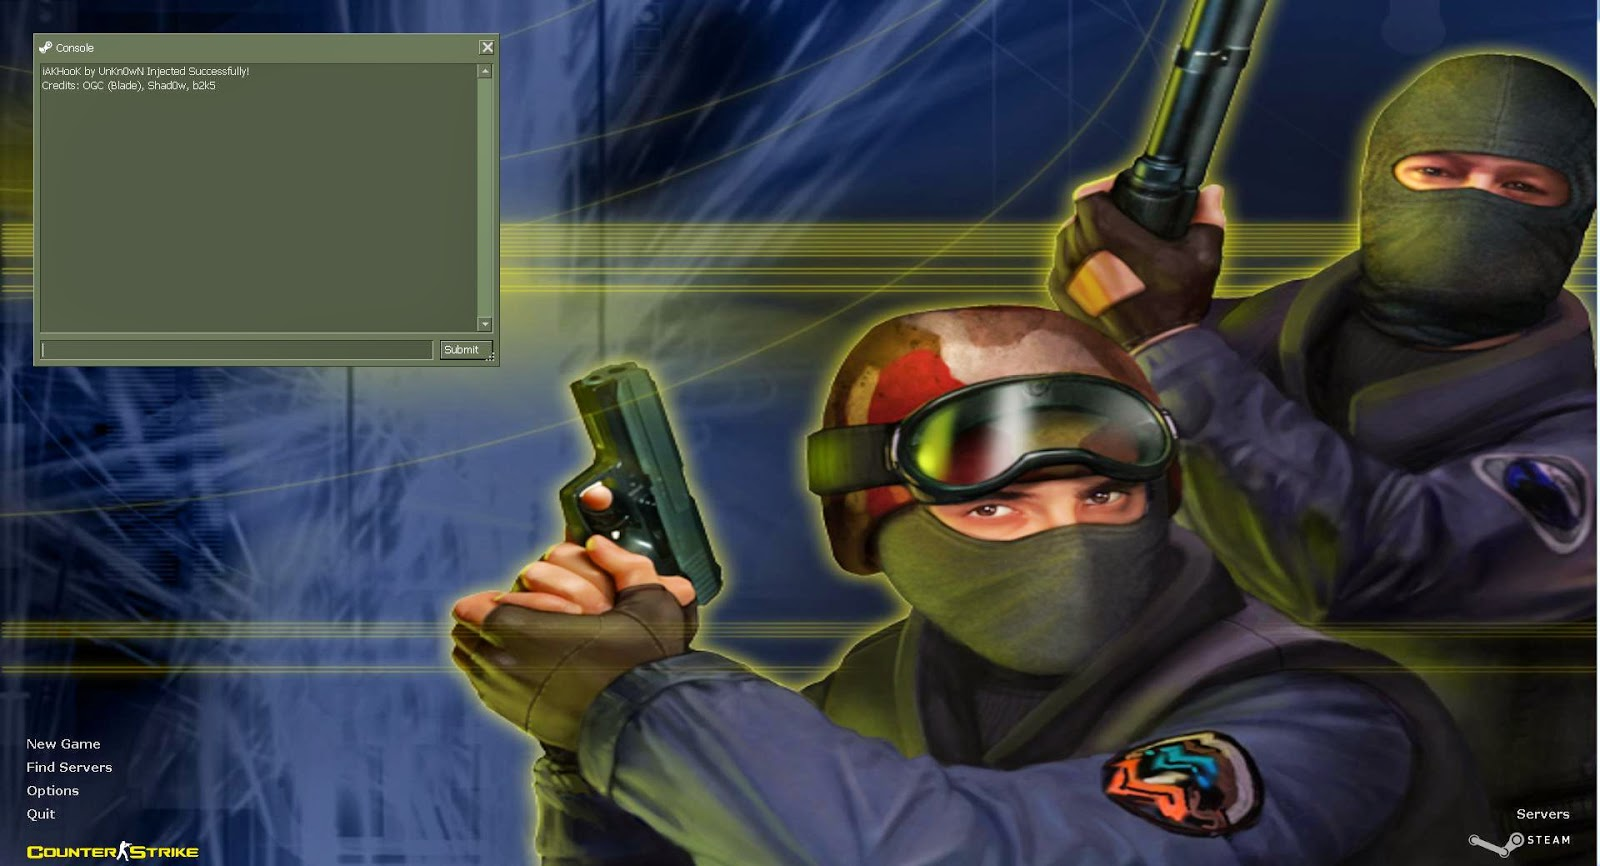 4Pe1THZ Counter Strike Aimbot Wallhack Hileleri 03.05.2014